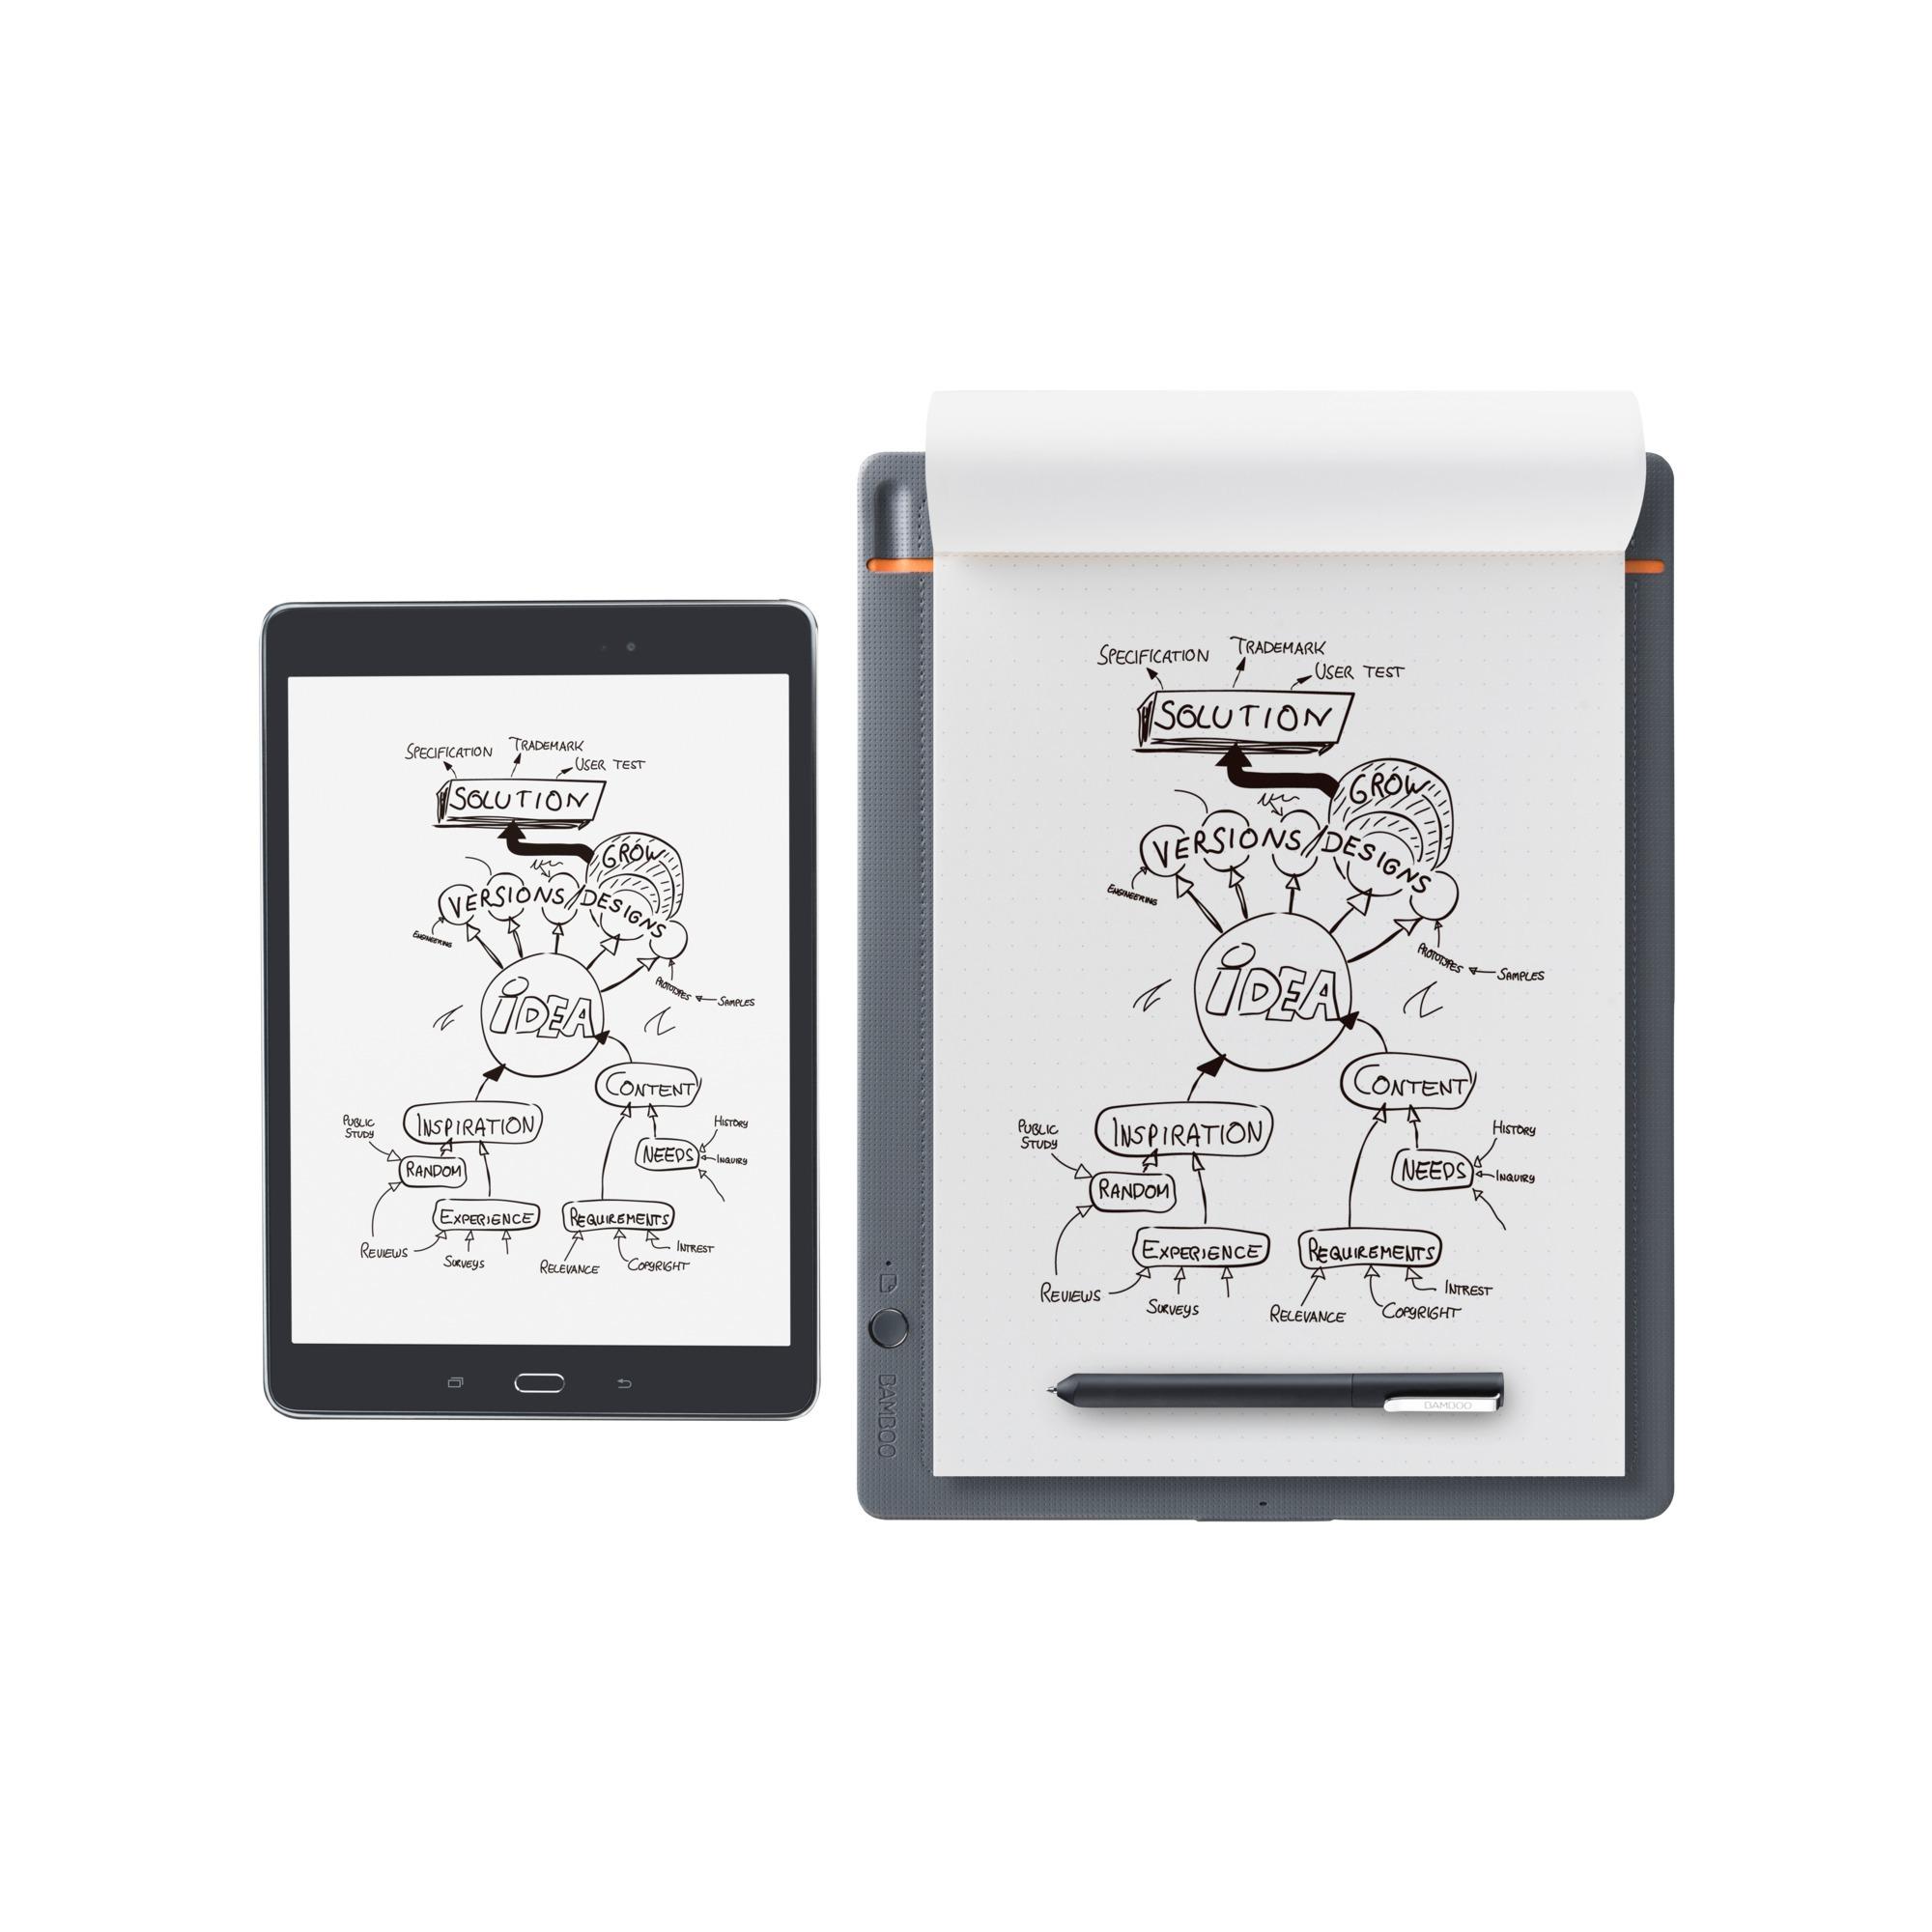 Bamboo CDS-810S Gris, Naranja tableta digitalizadora, Tableta gráfica